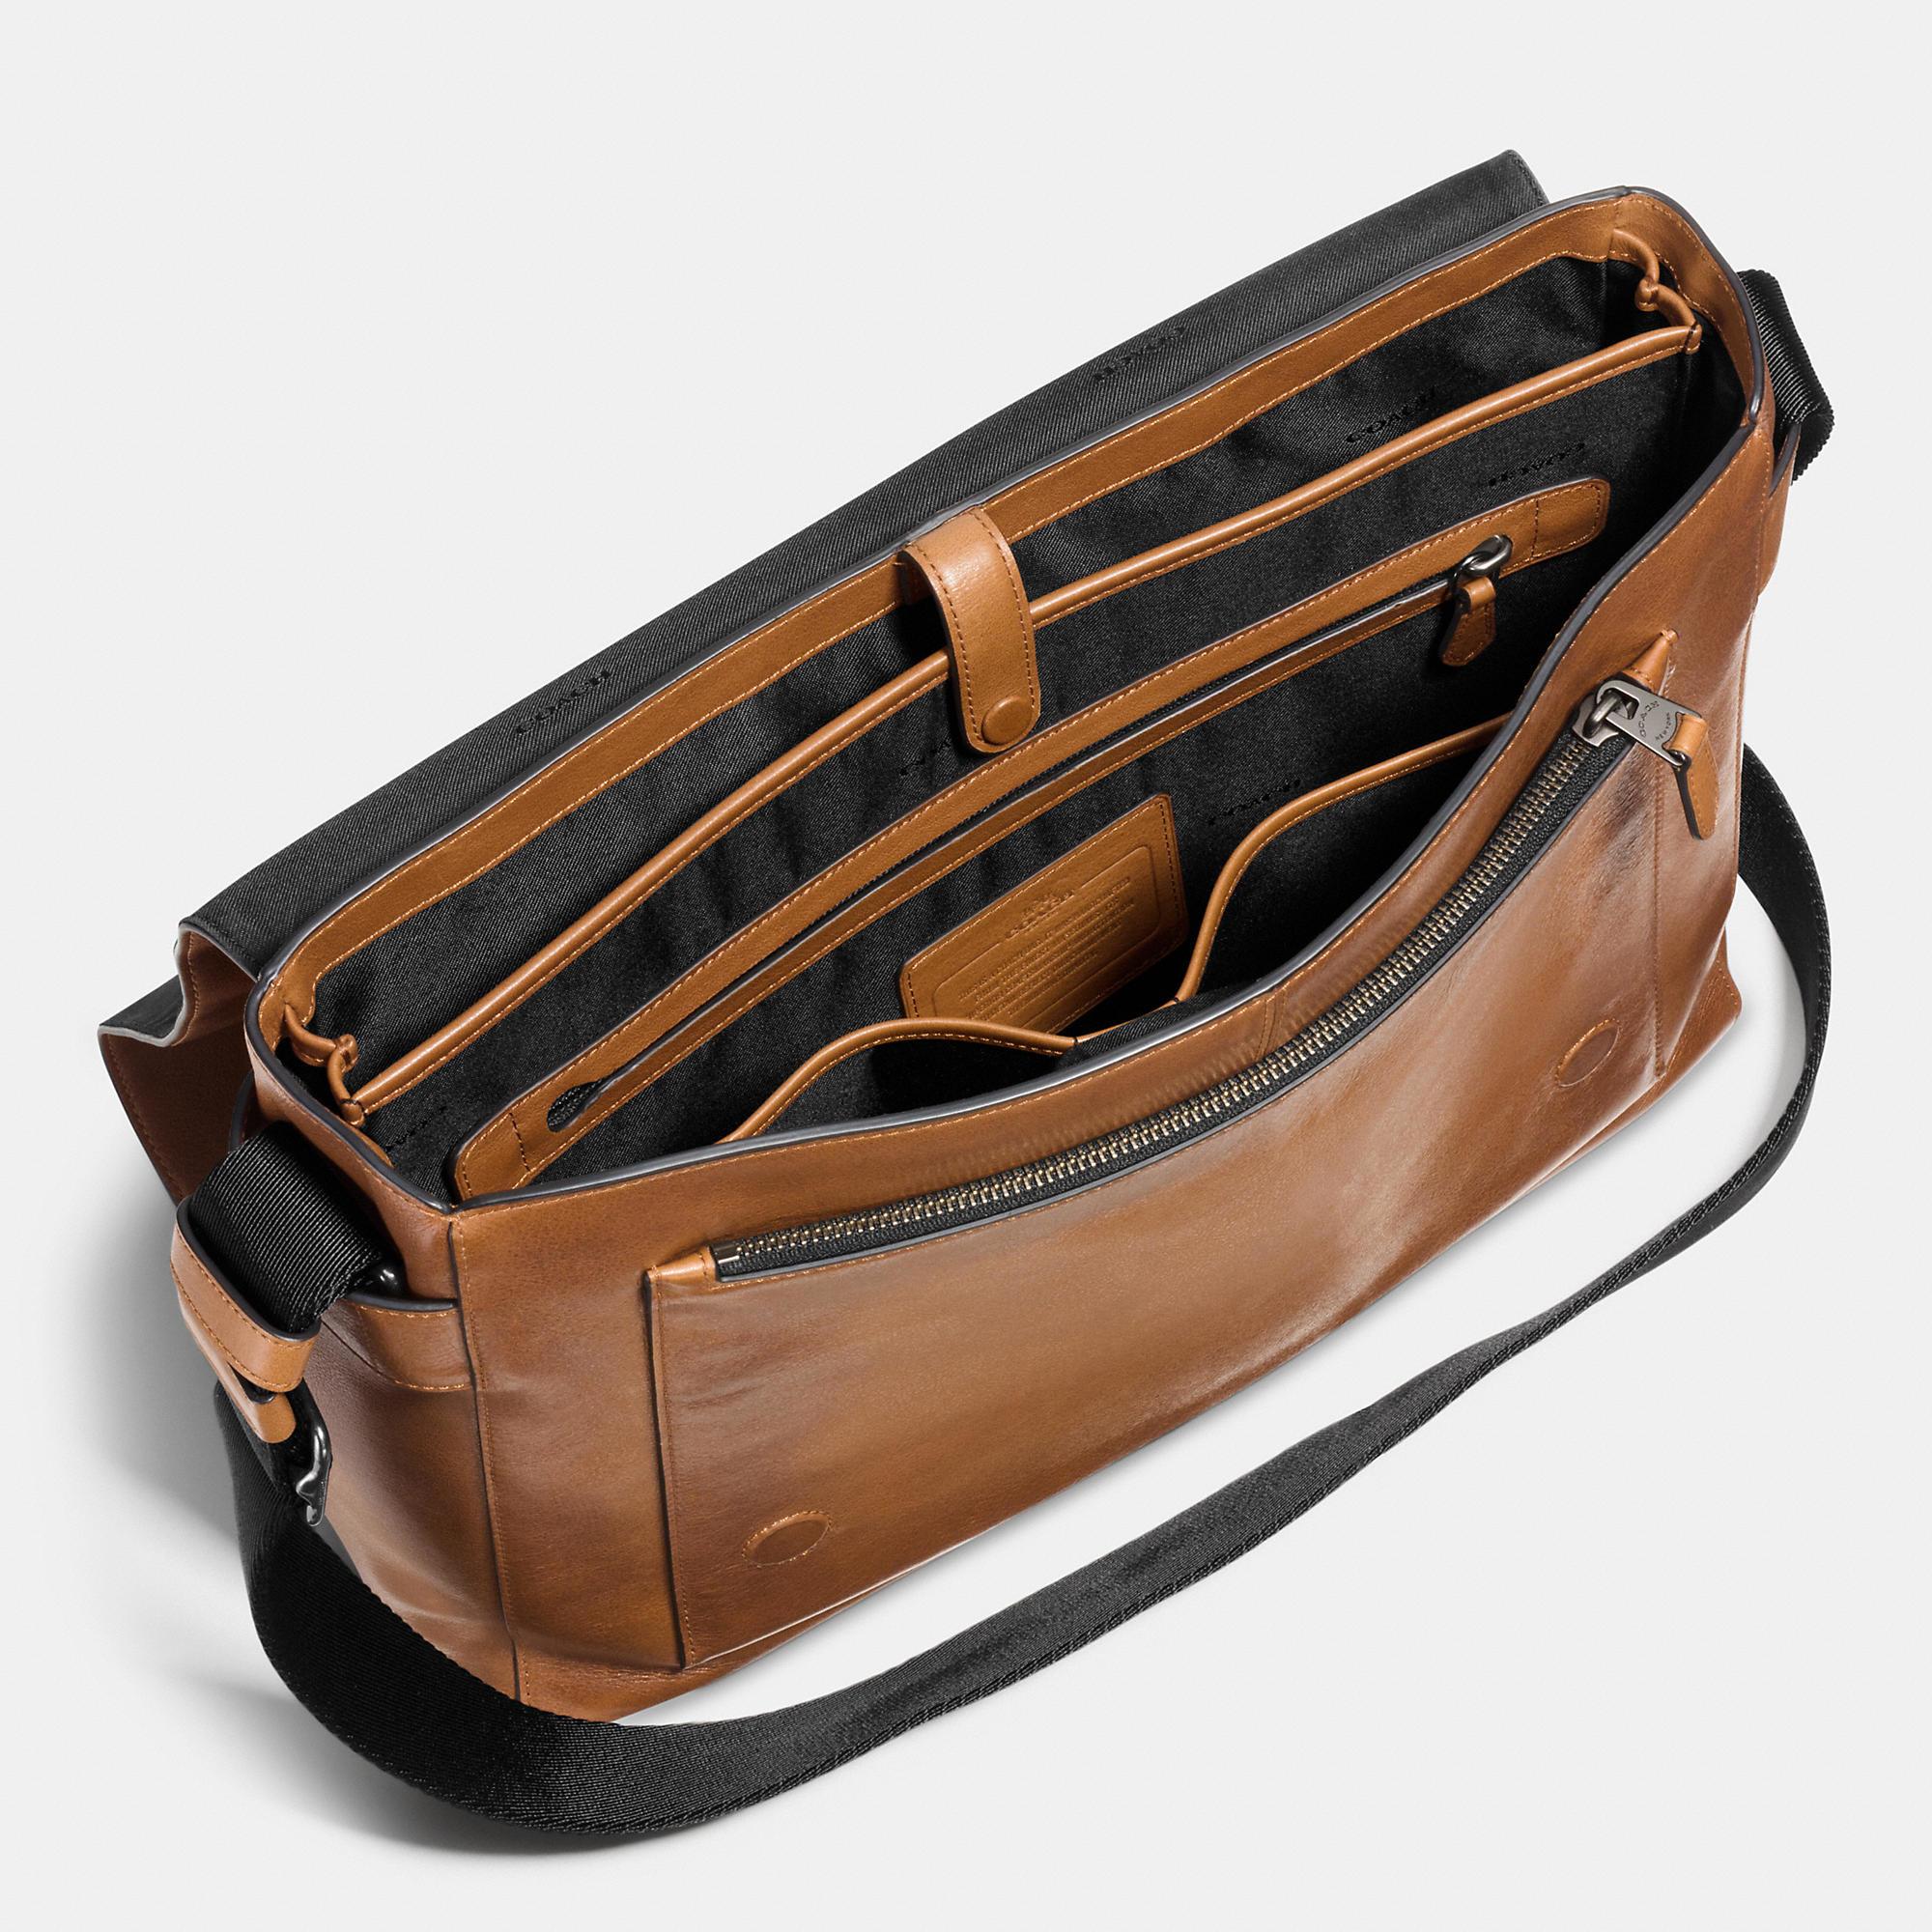 71858f514697 Lyst - COACH Metropolitan Courier In Sport Calf Leather in Brown